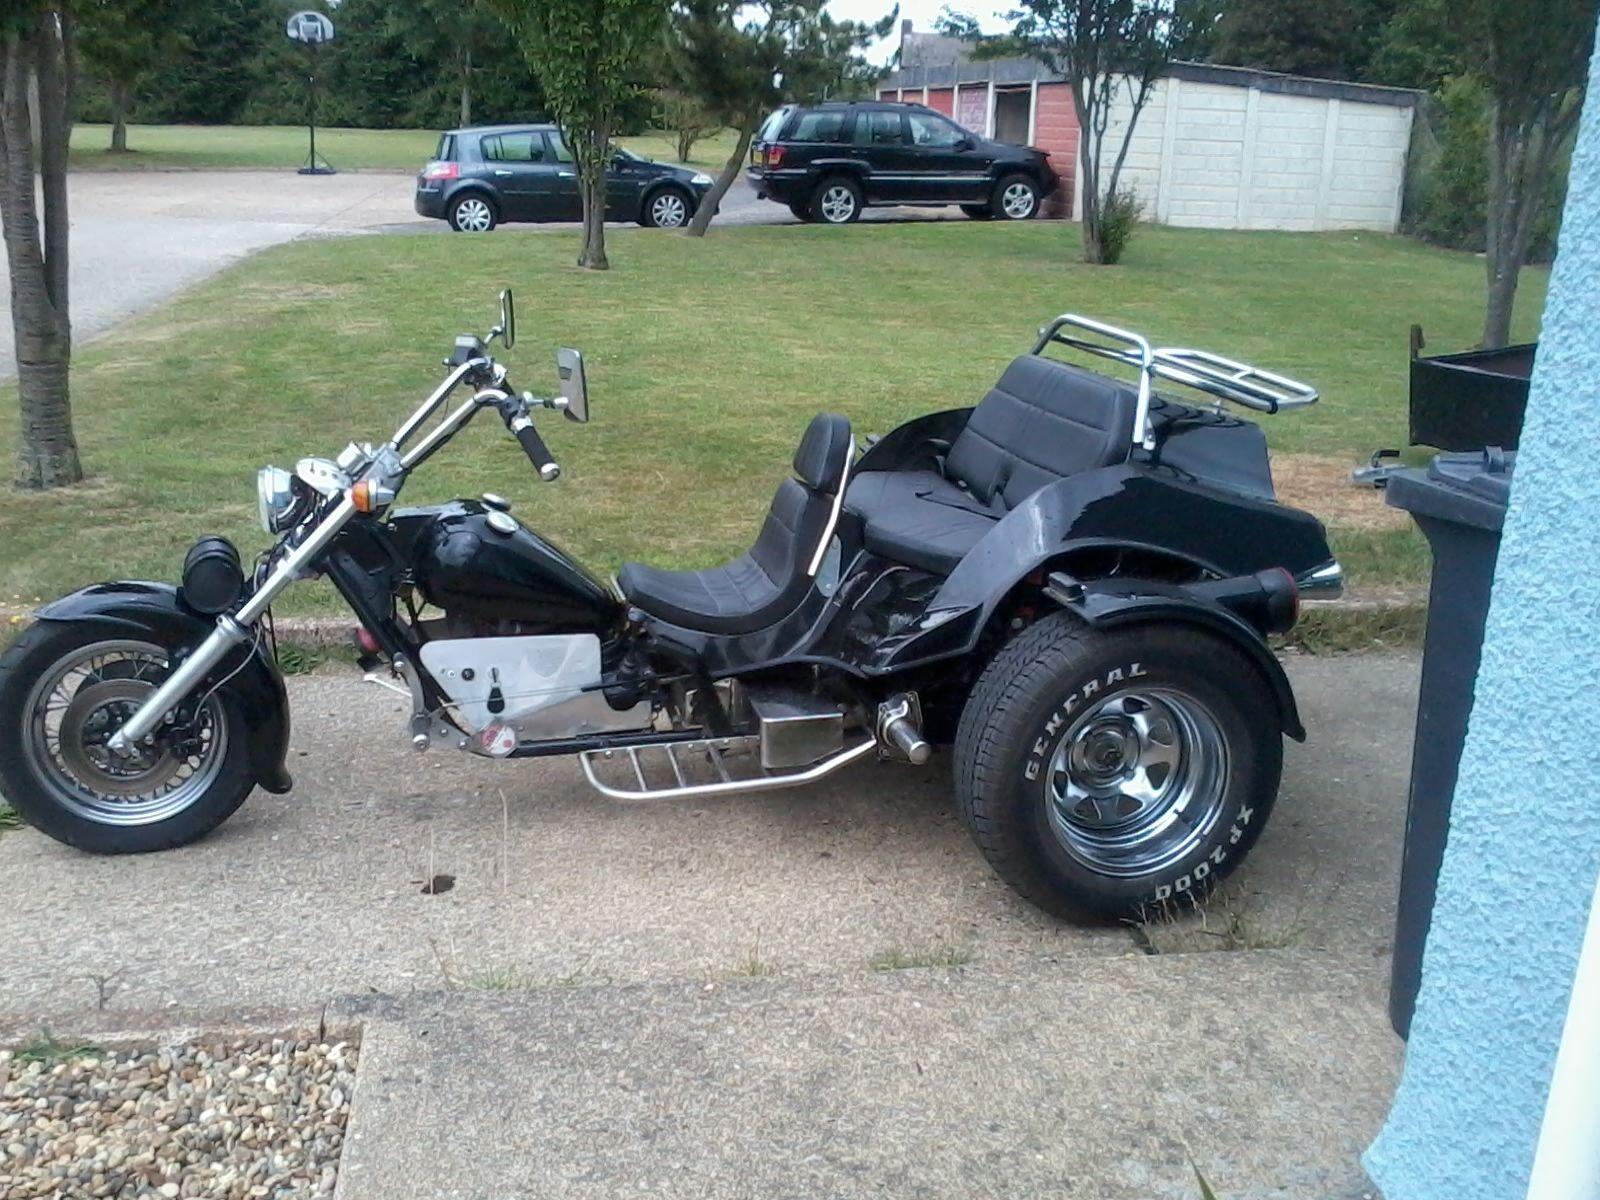 Vw Trike 1600 Ebay Vw Trike Trike Trike Motorcycle